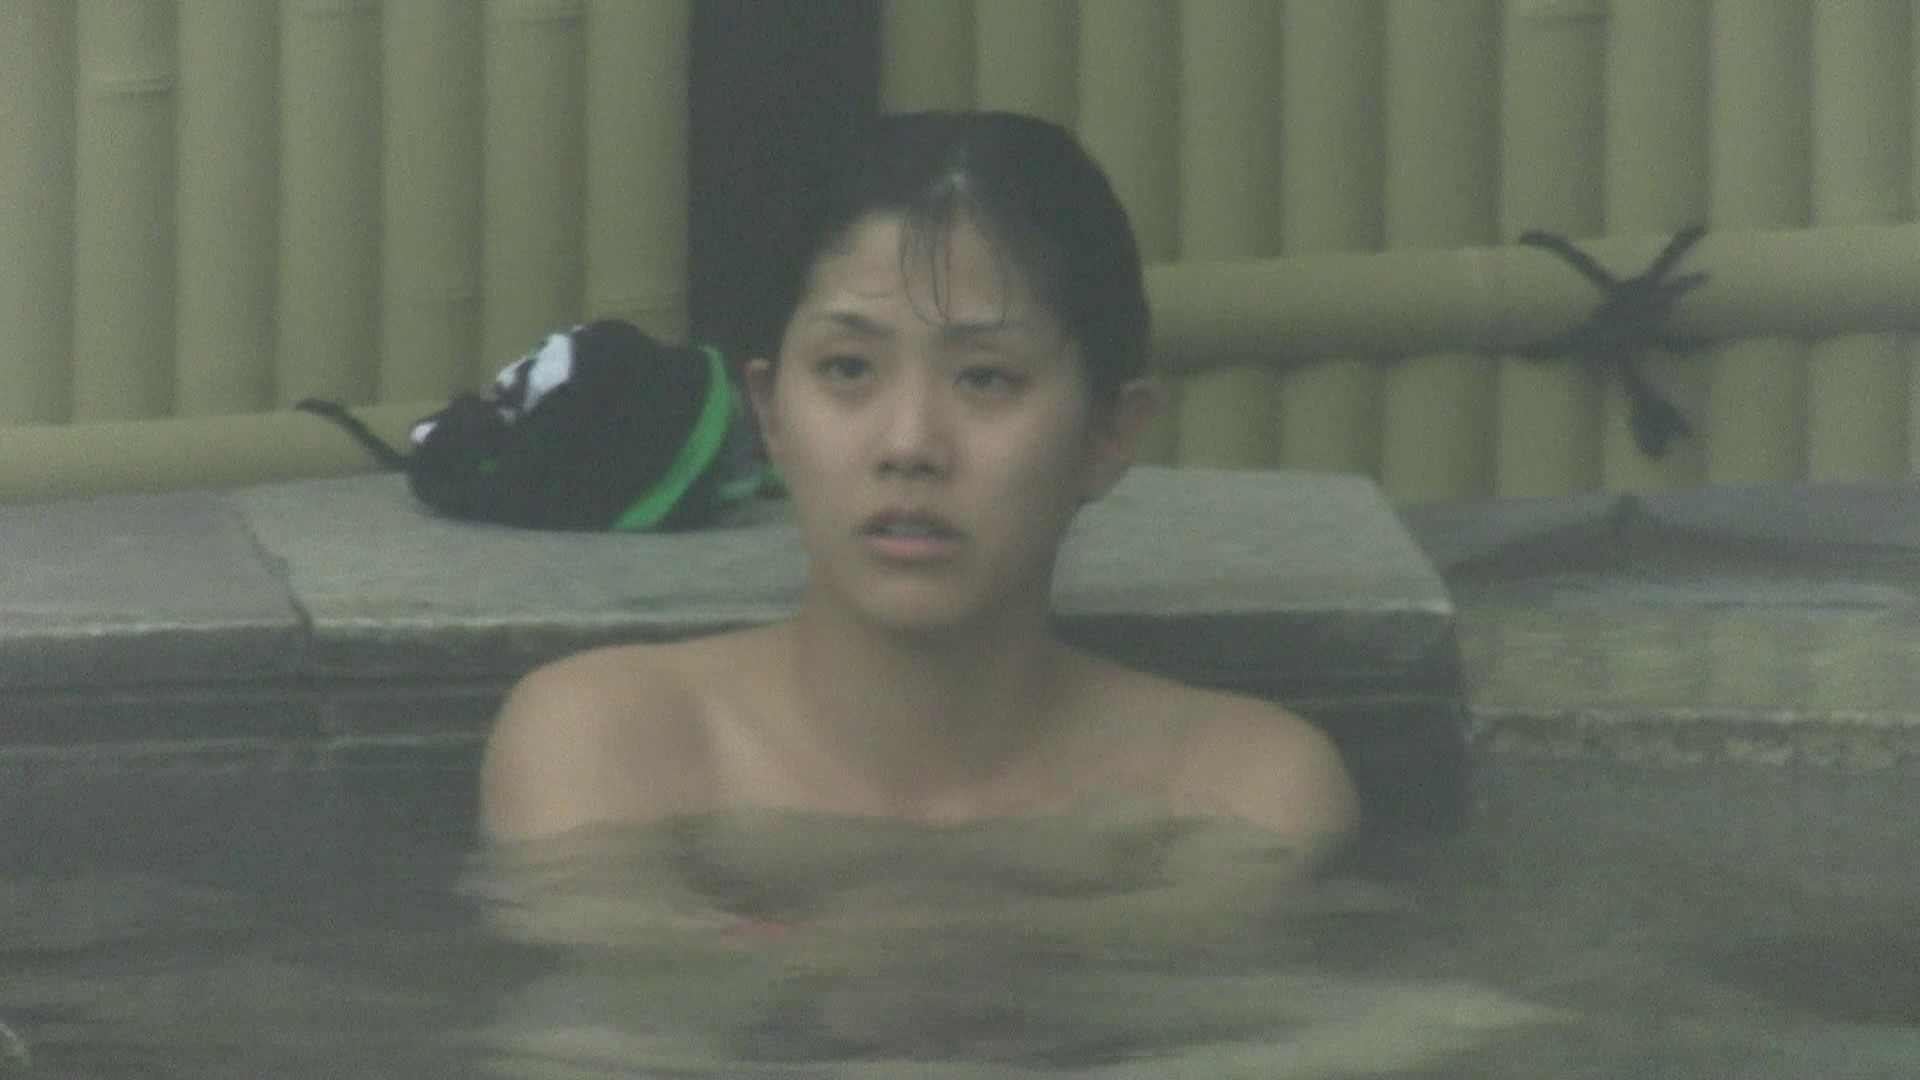 Aquaな露天風呂Vol.174 露天 盗撮画像 97連発 63